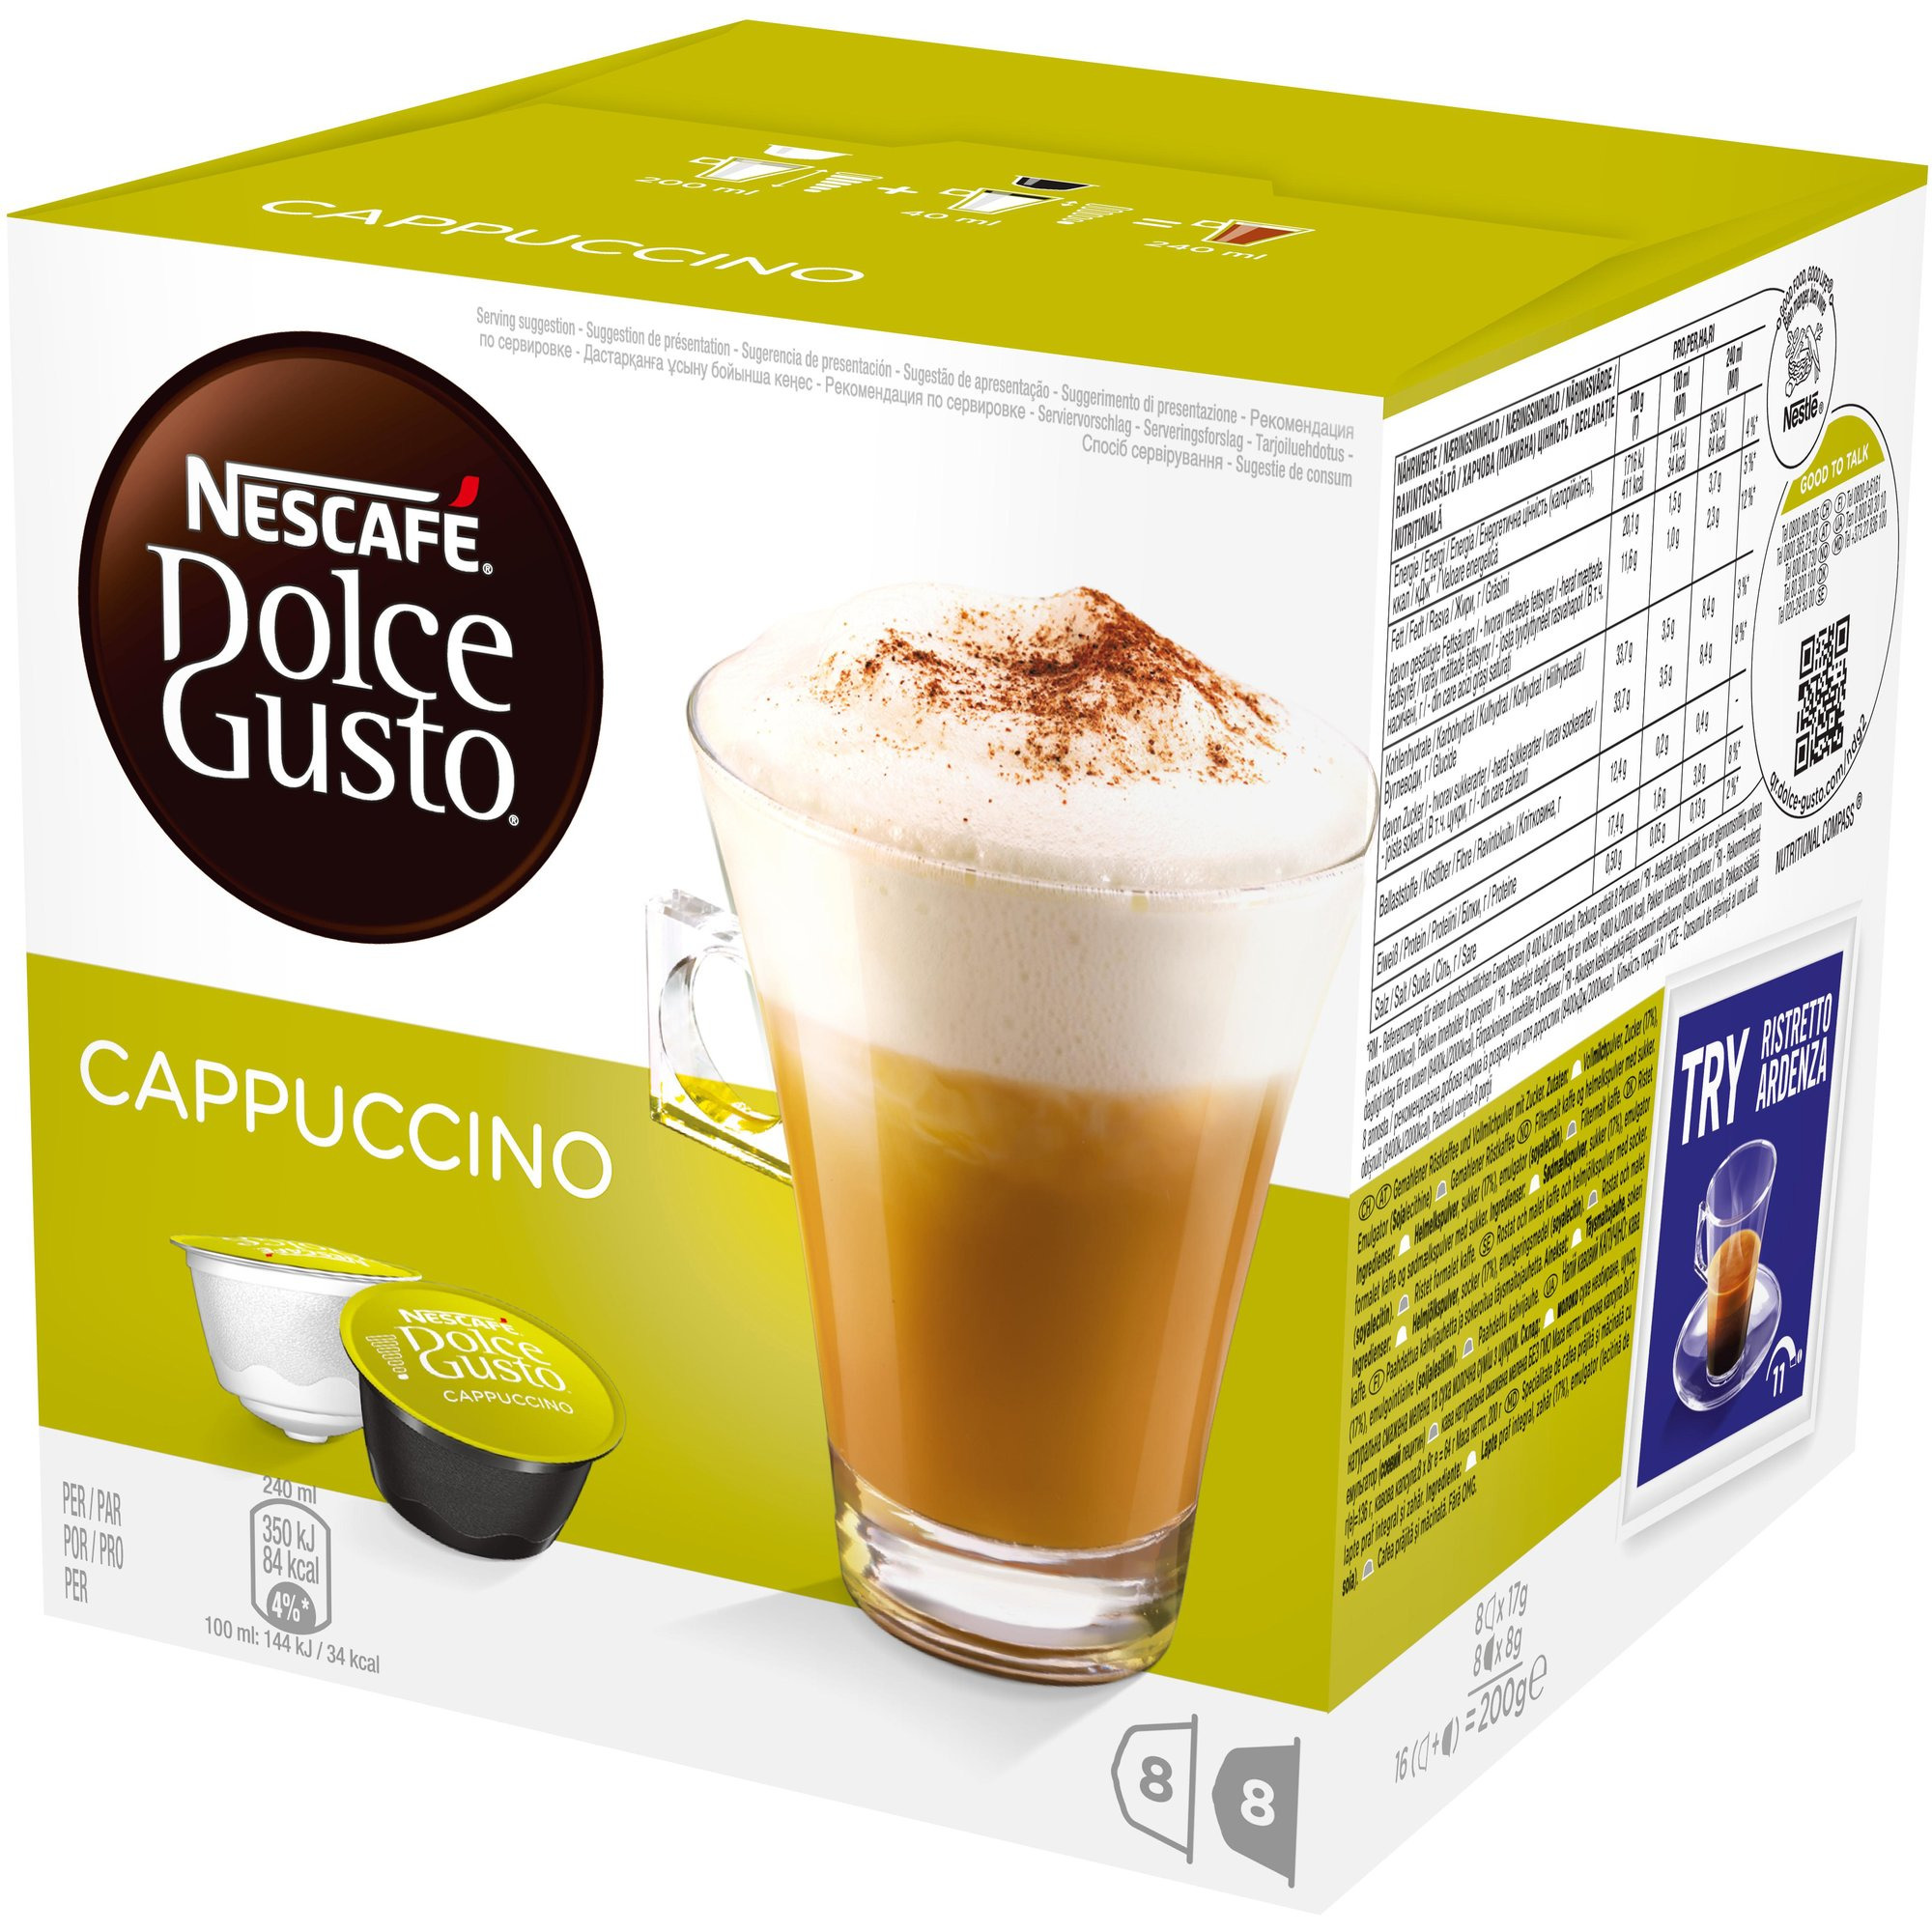 Nescafé Dolce Gusto Cappuccino Kaffekapslar